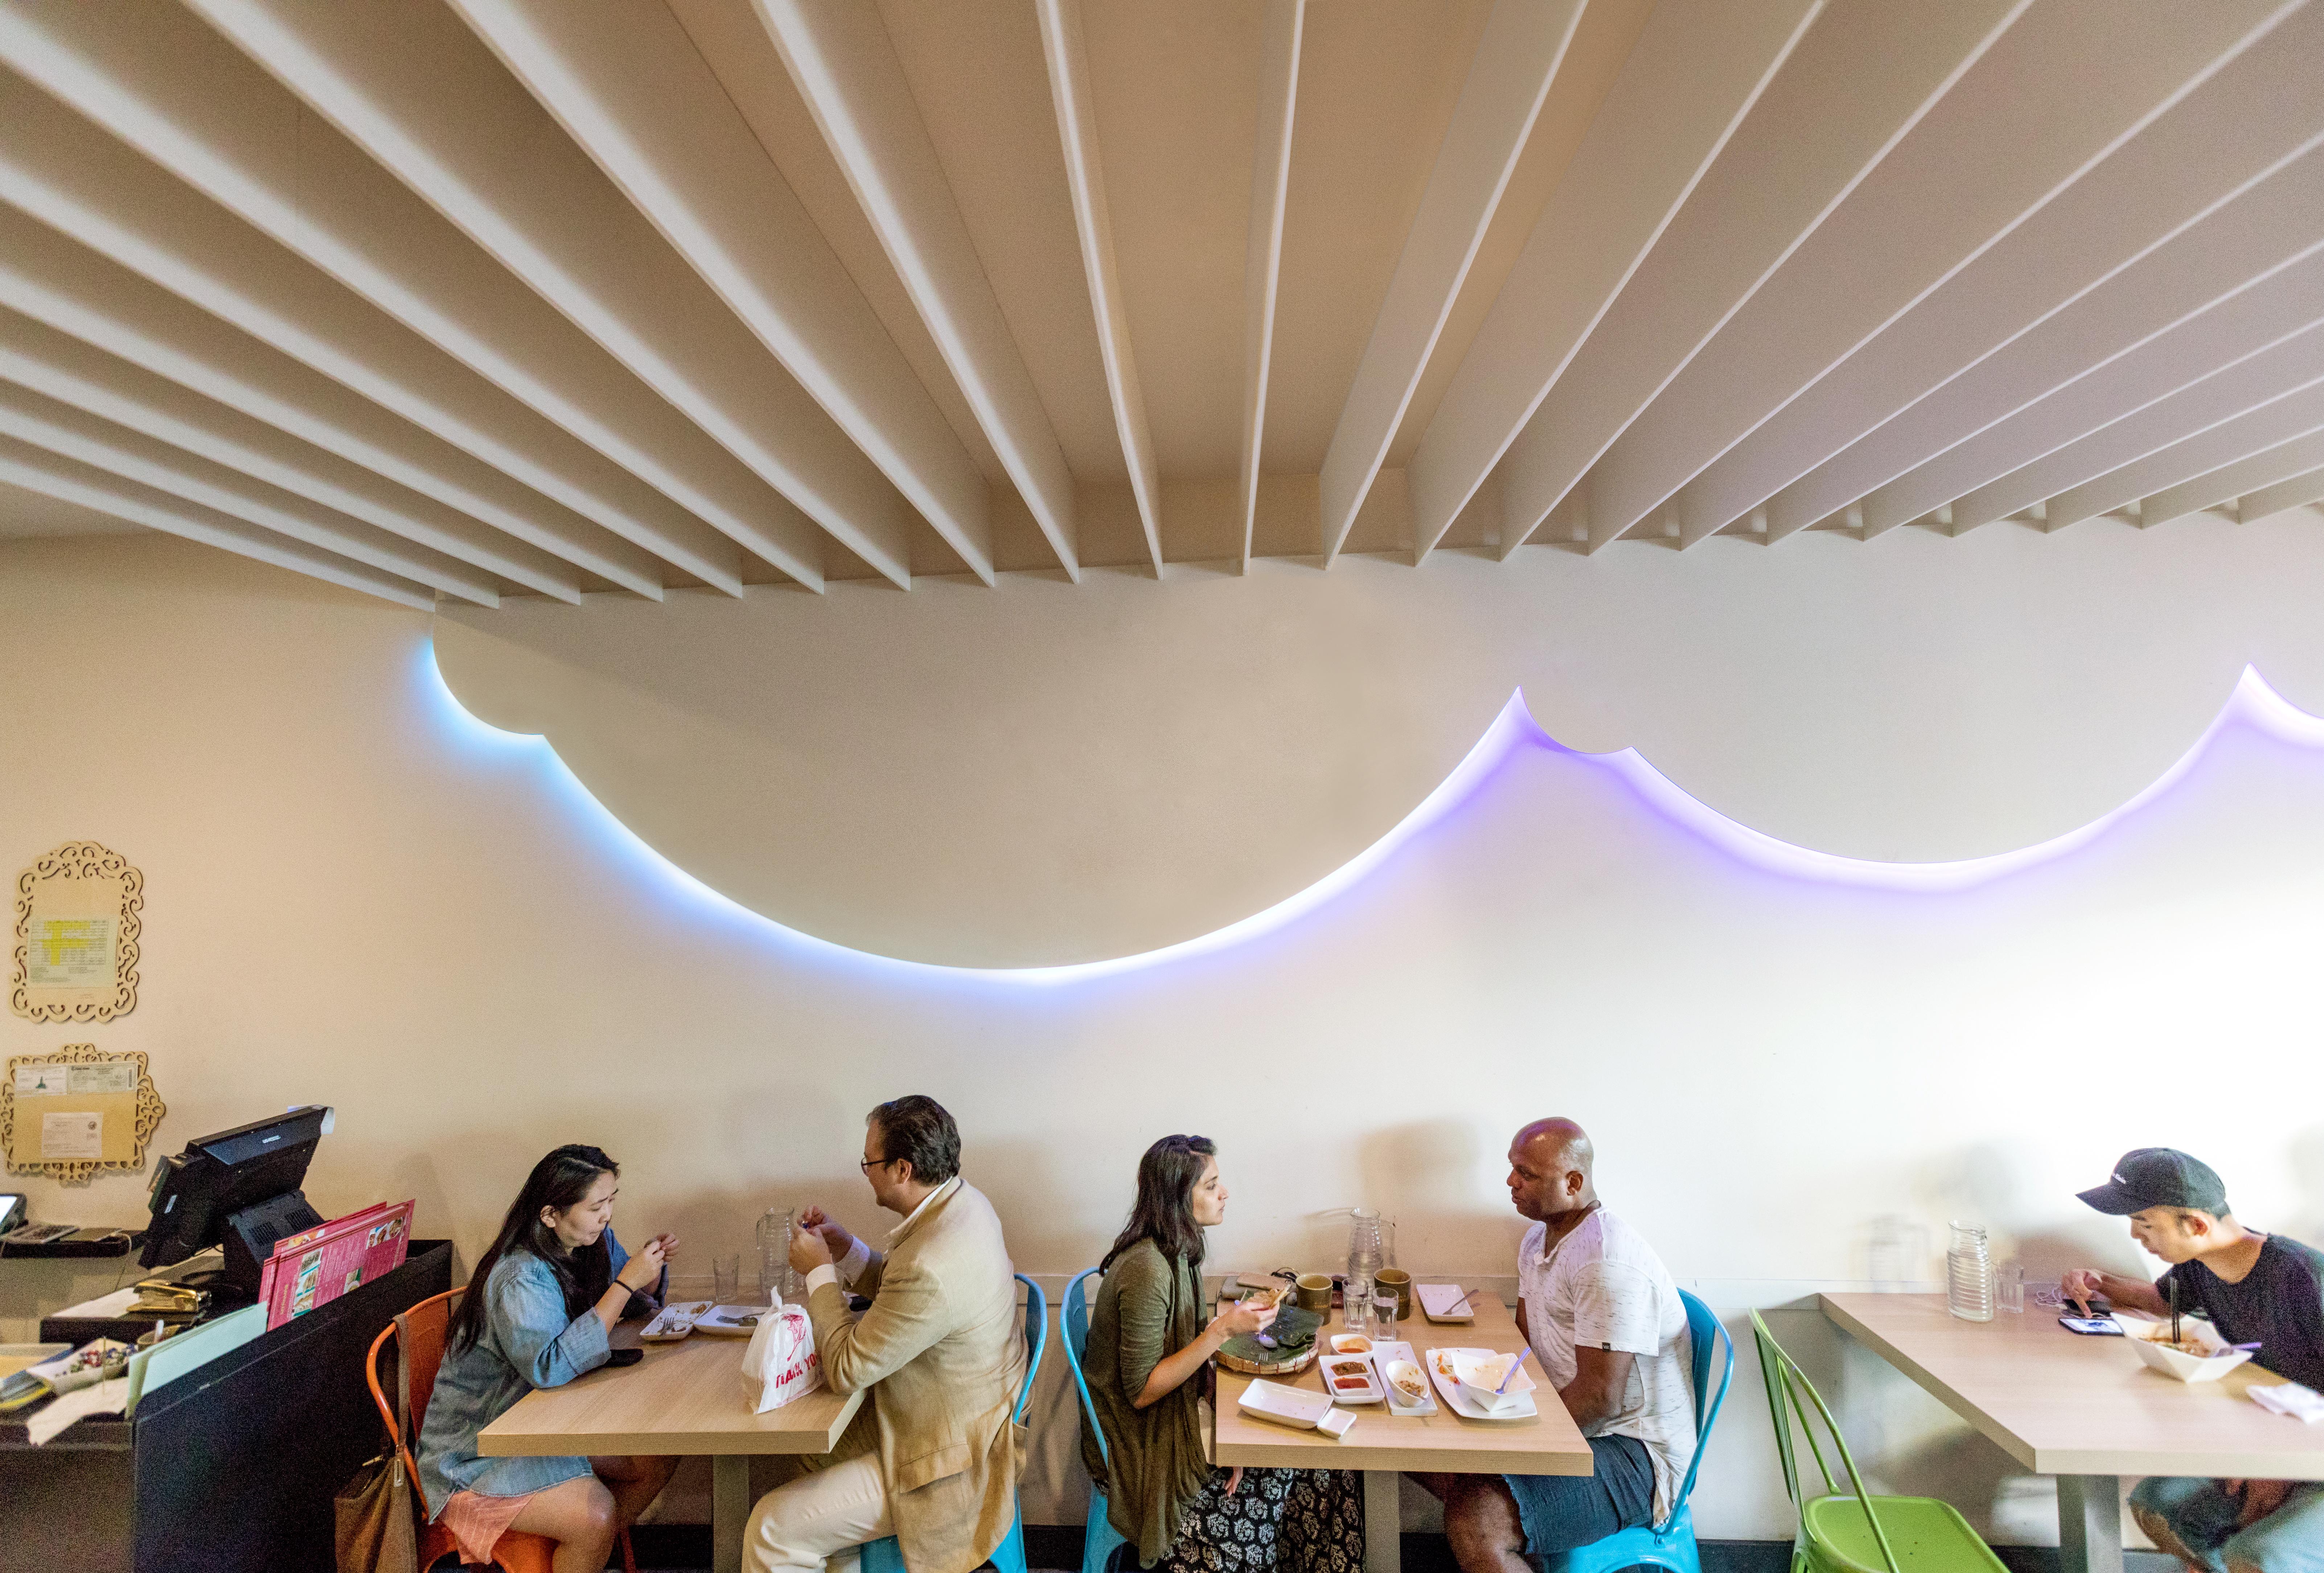 Ep-Simple-Baffle-Restaurant-Hospitality-Ceiling-Myanmar-Jakob-Layman-2